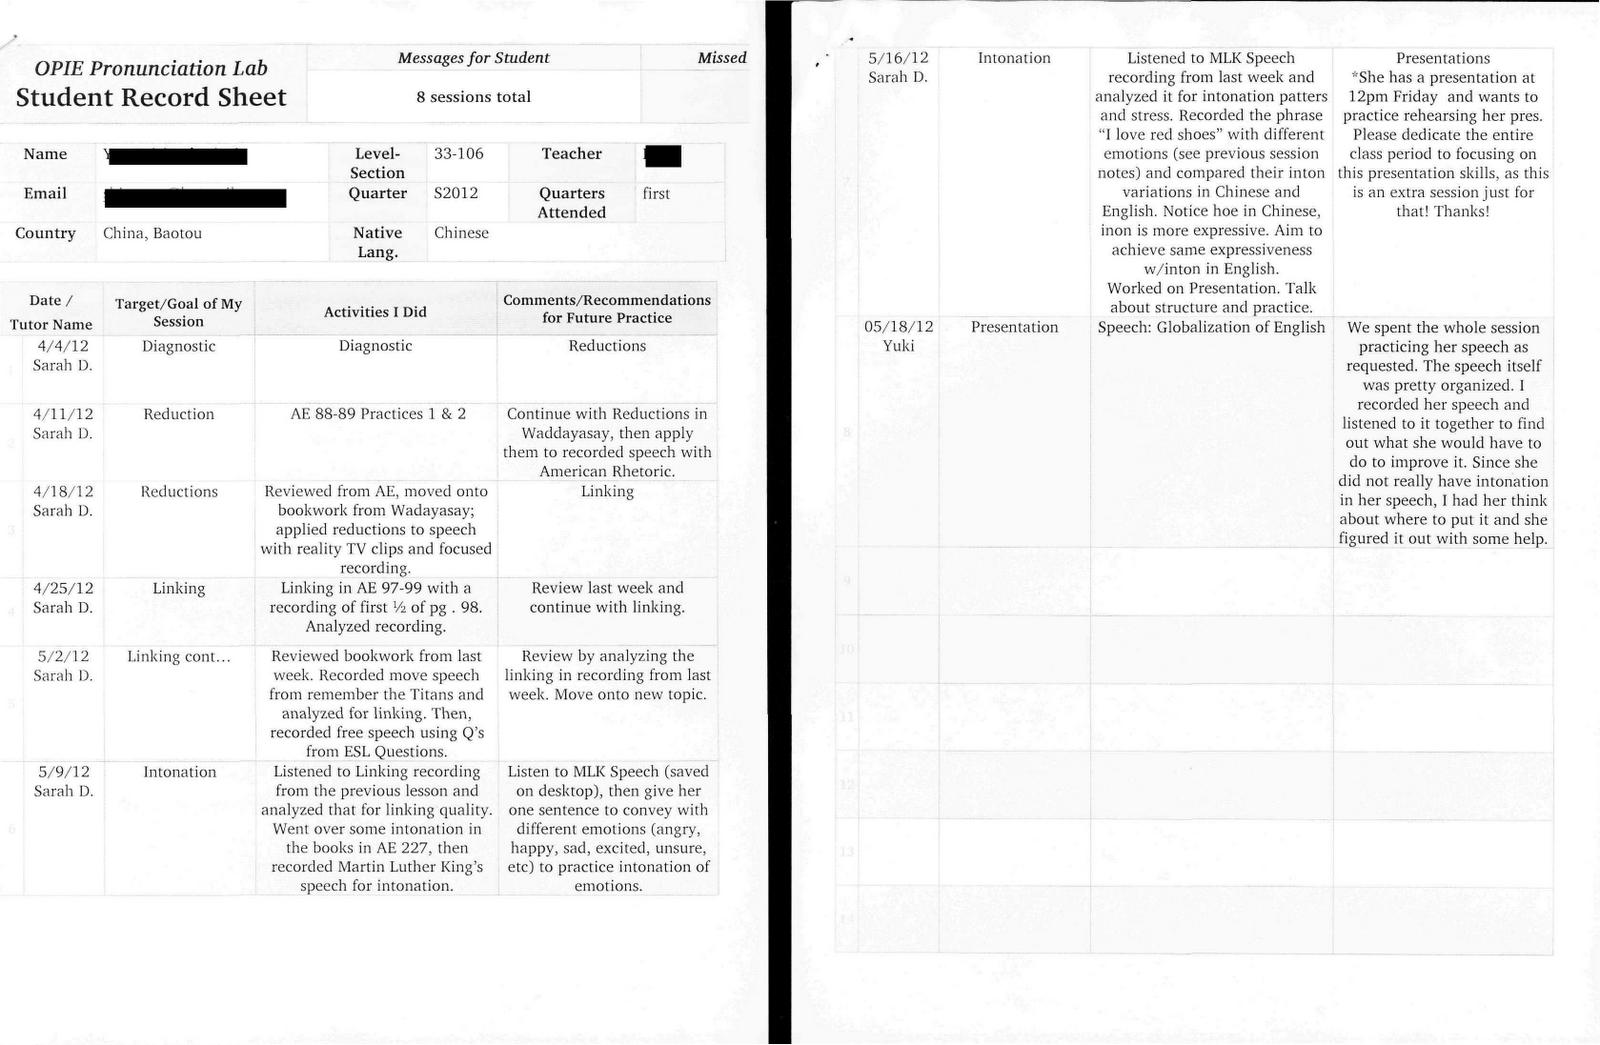 Teaching Portfolio: OPIE Pronunciation Lab Lesson Plans